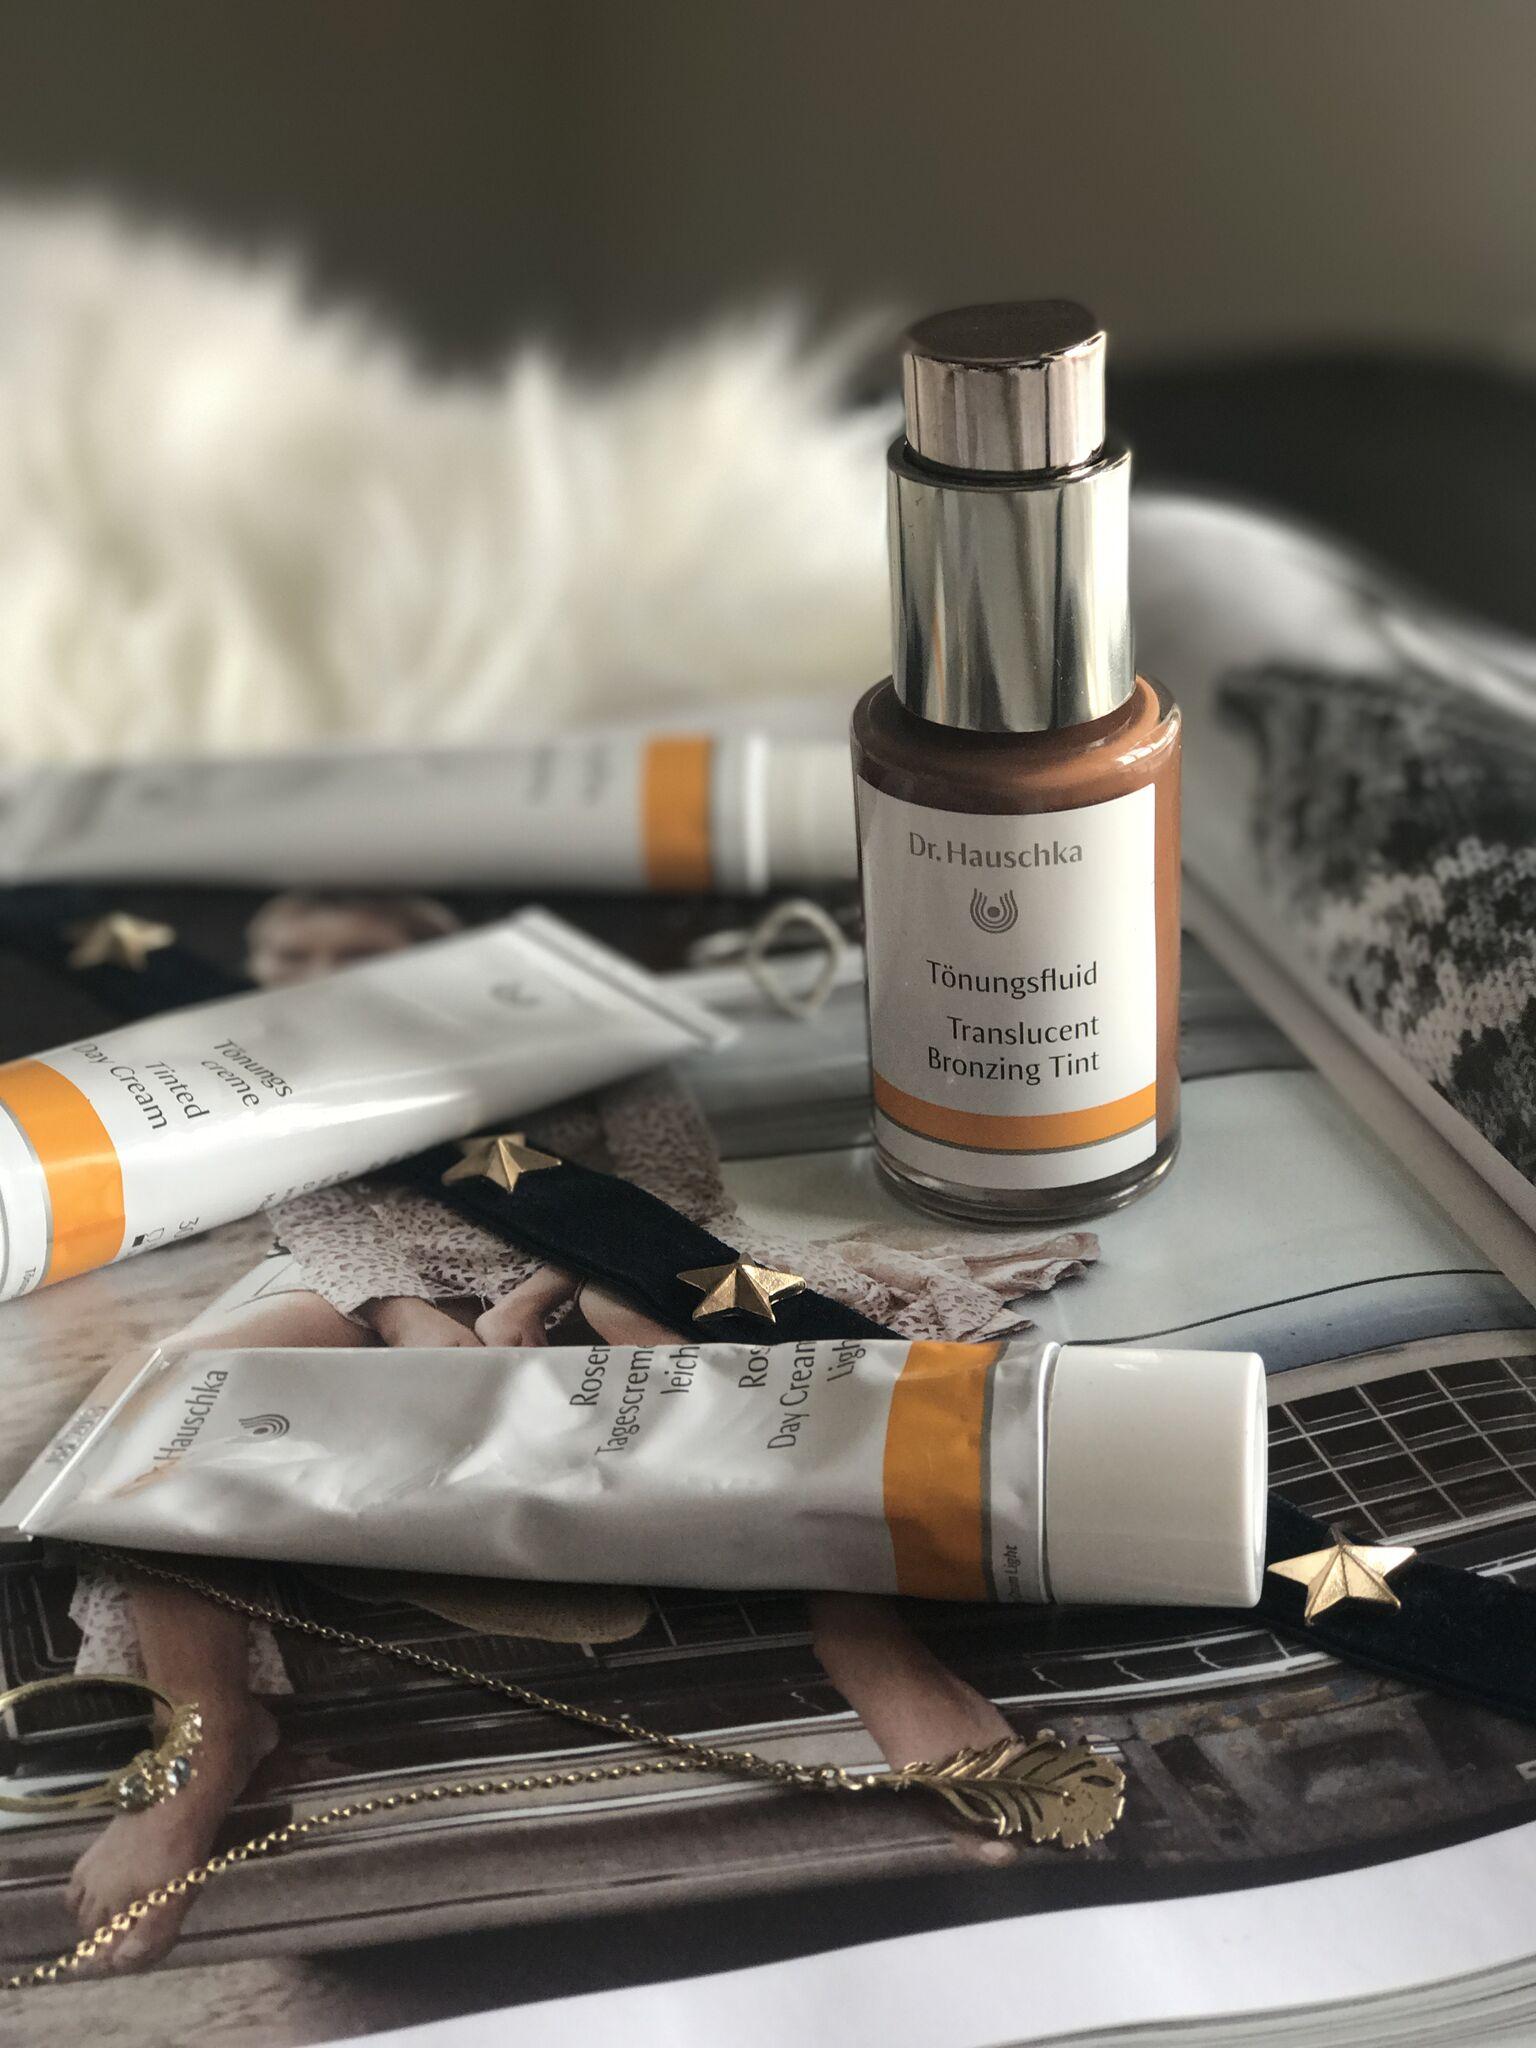 Dr Hauschka, The Creative Larder Bronze Tint Review